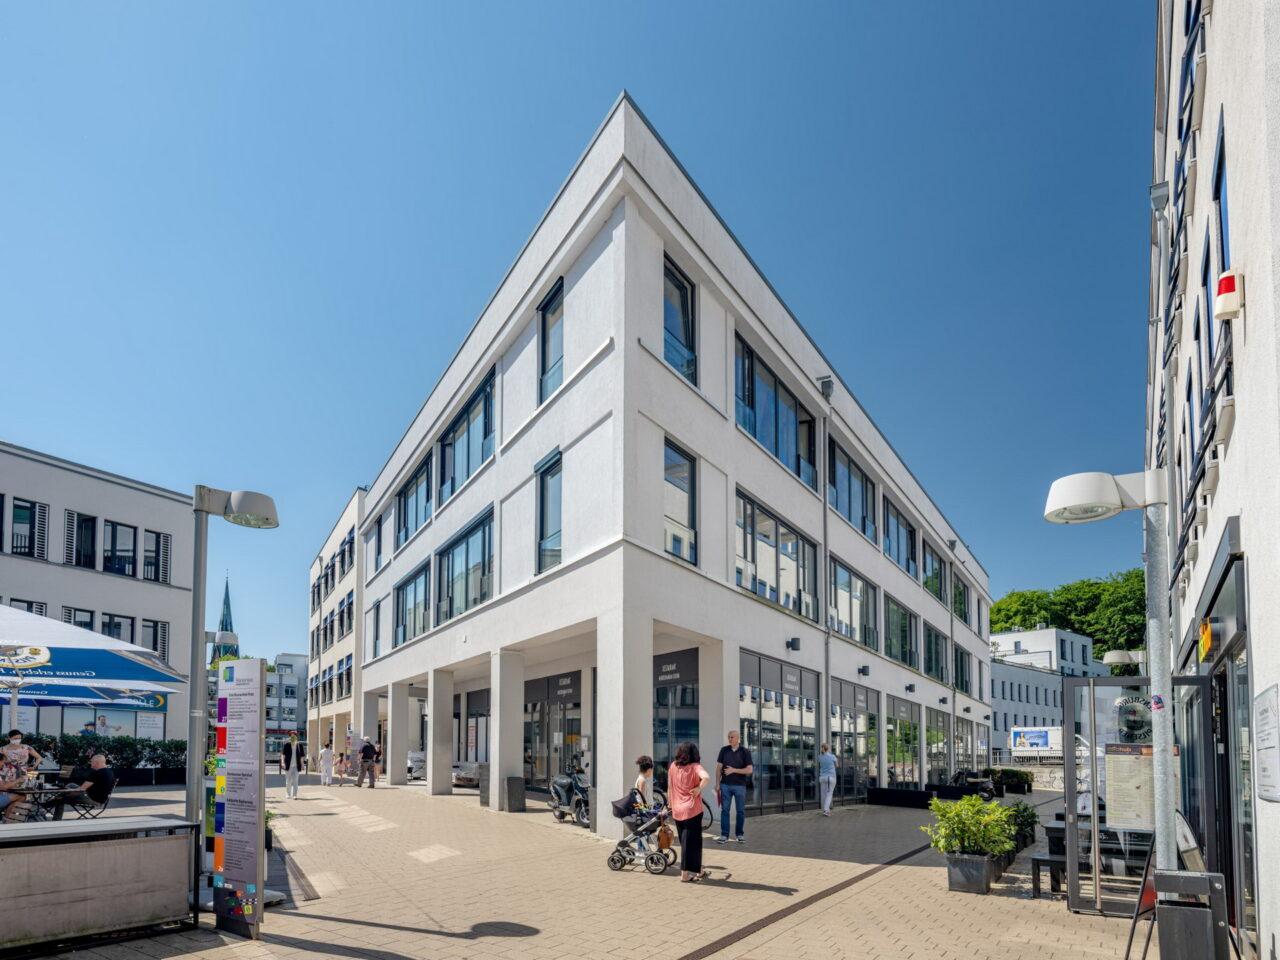 https://intelligent-investors.de/wp-content/uploads/2020/09/Hamburg-Blankenese_2-1280x960.jpg